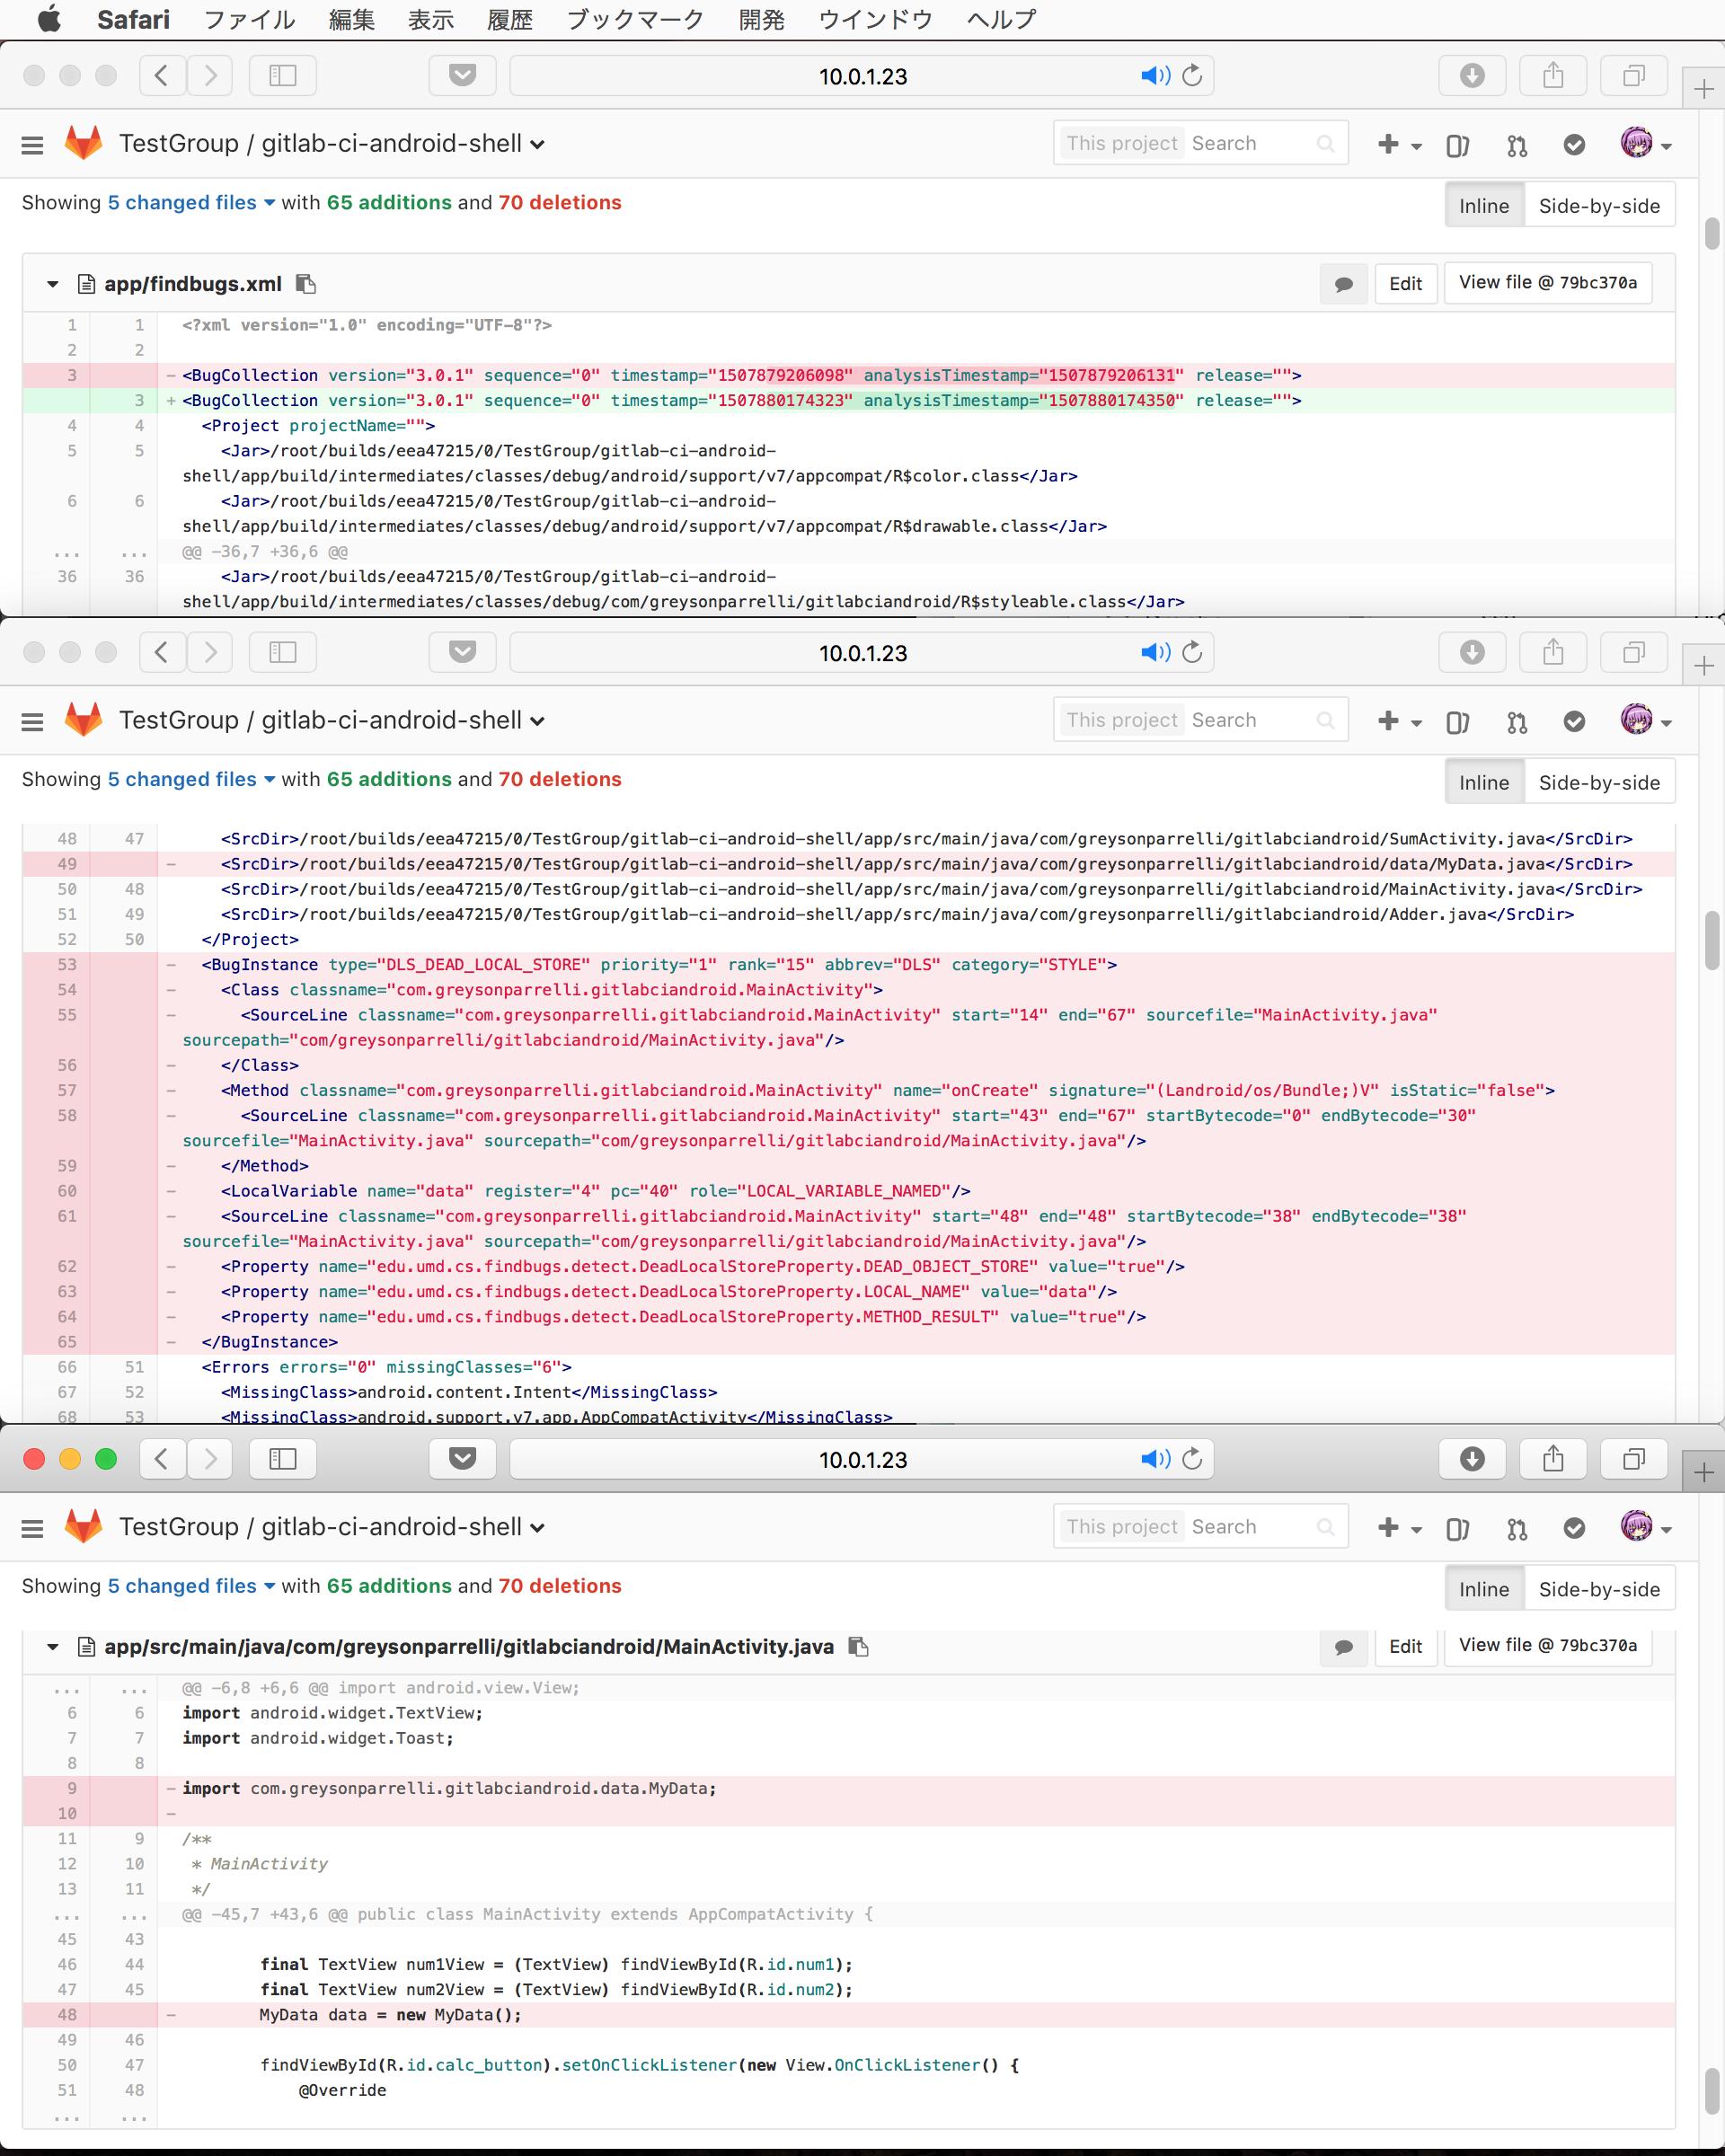 Screenshot-FindBugs.png